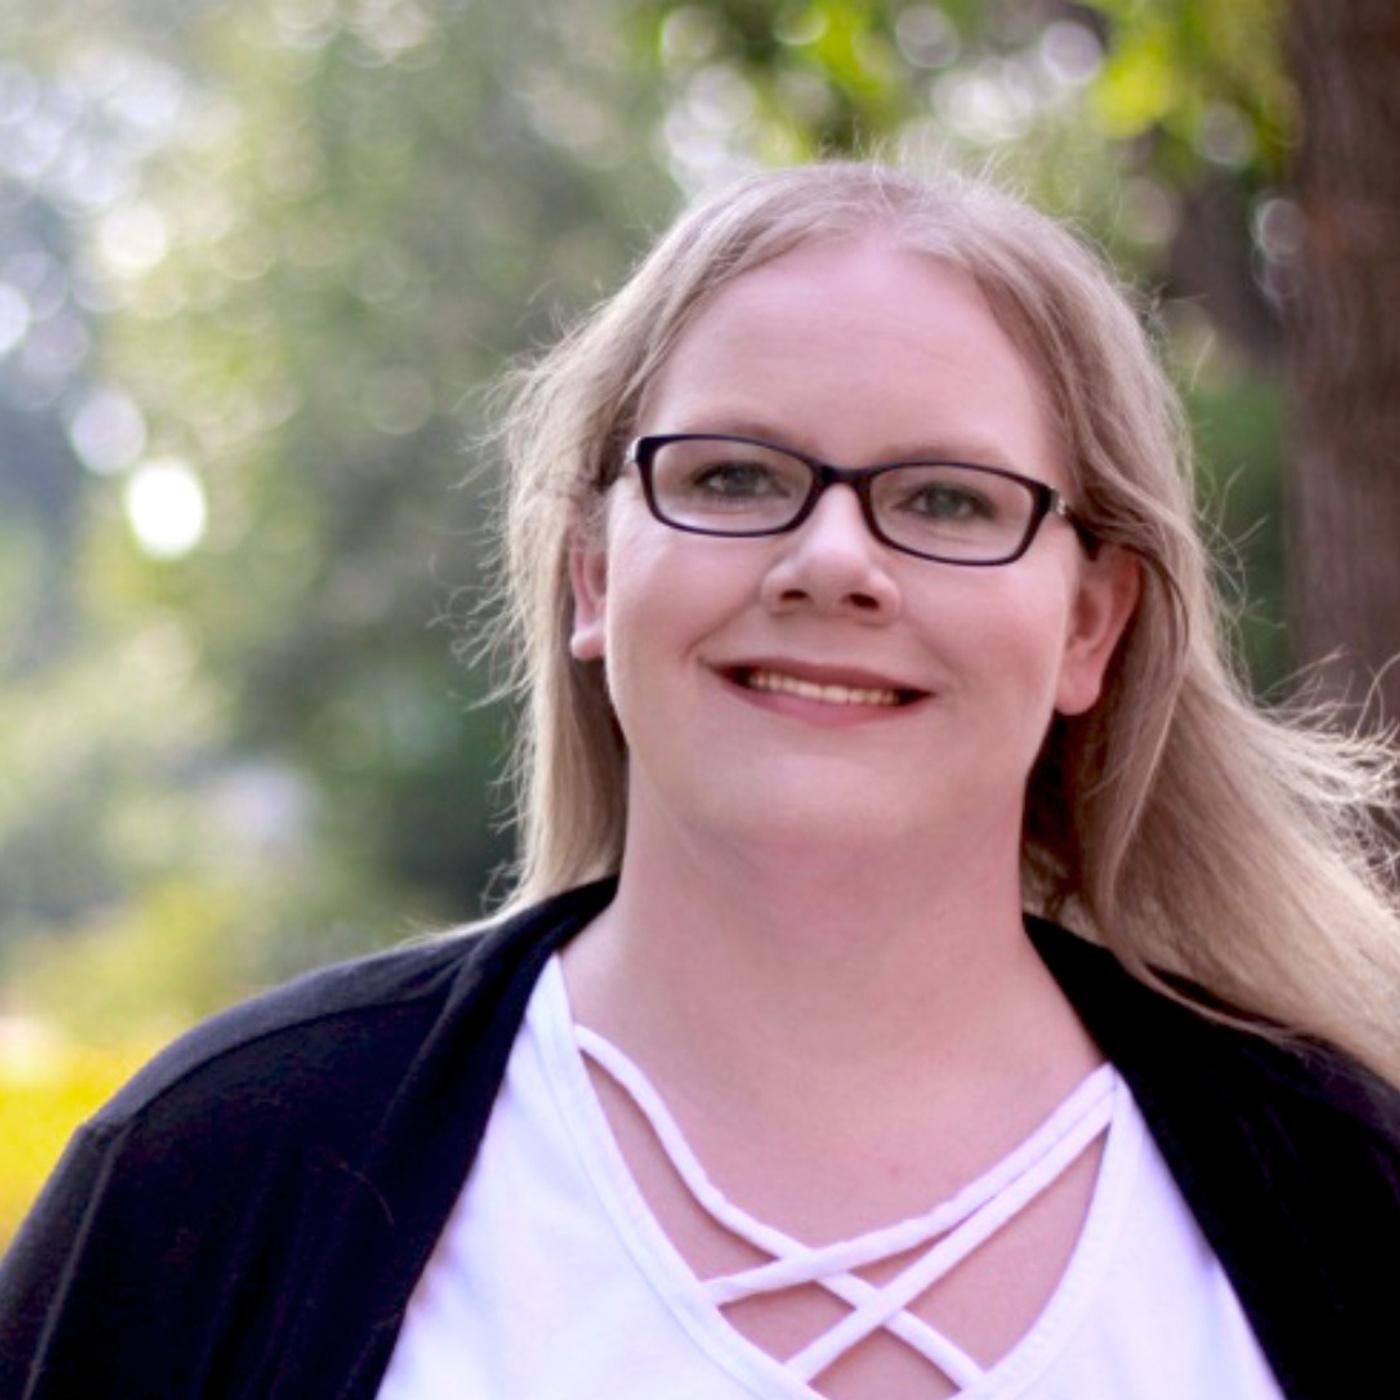 MN Cannabis Conversations with Maren Schroeder, Sensible Change Minnesota + Sensible Minnesota